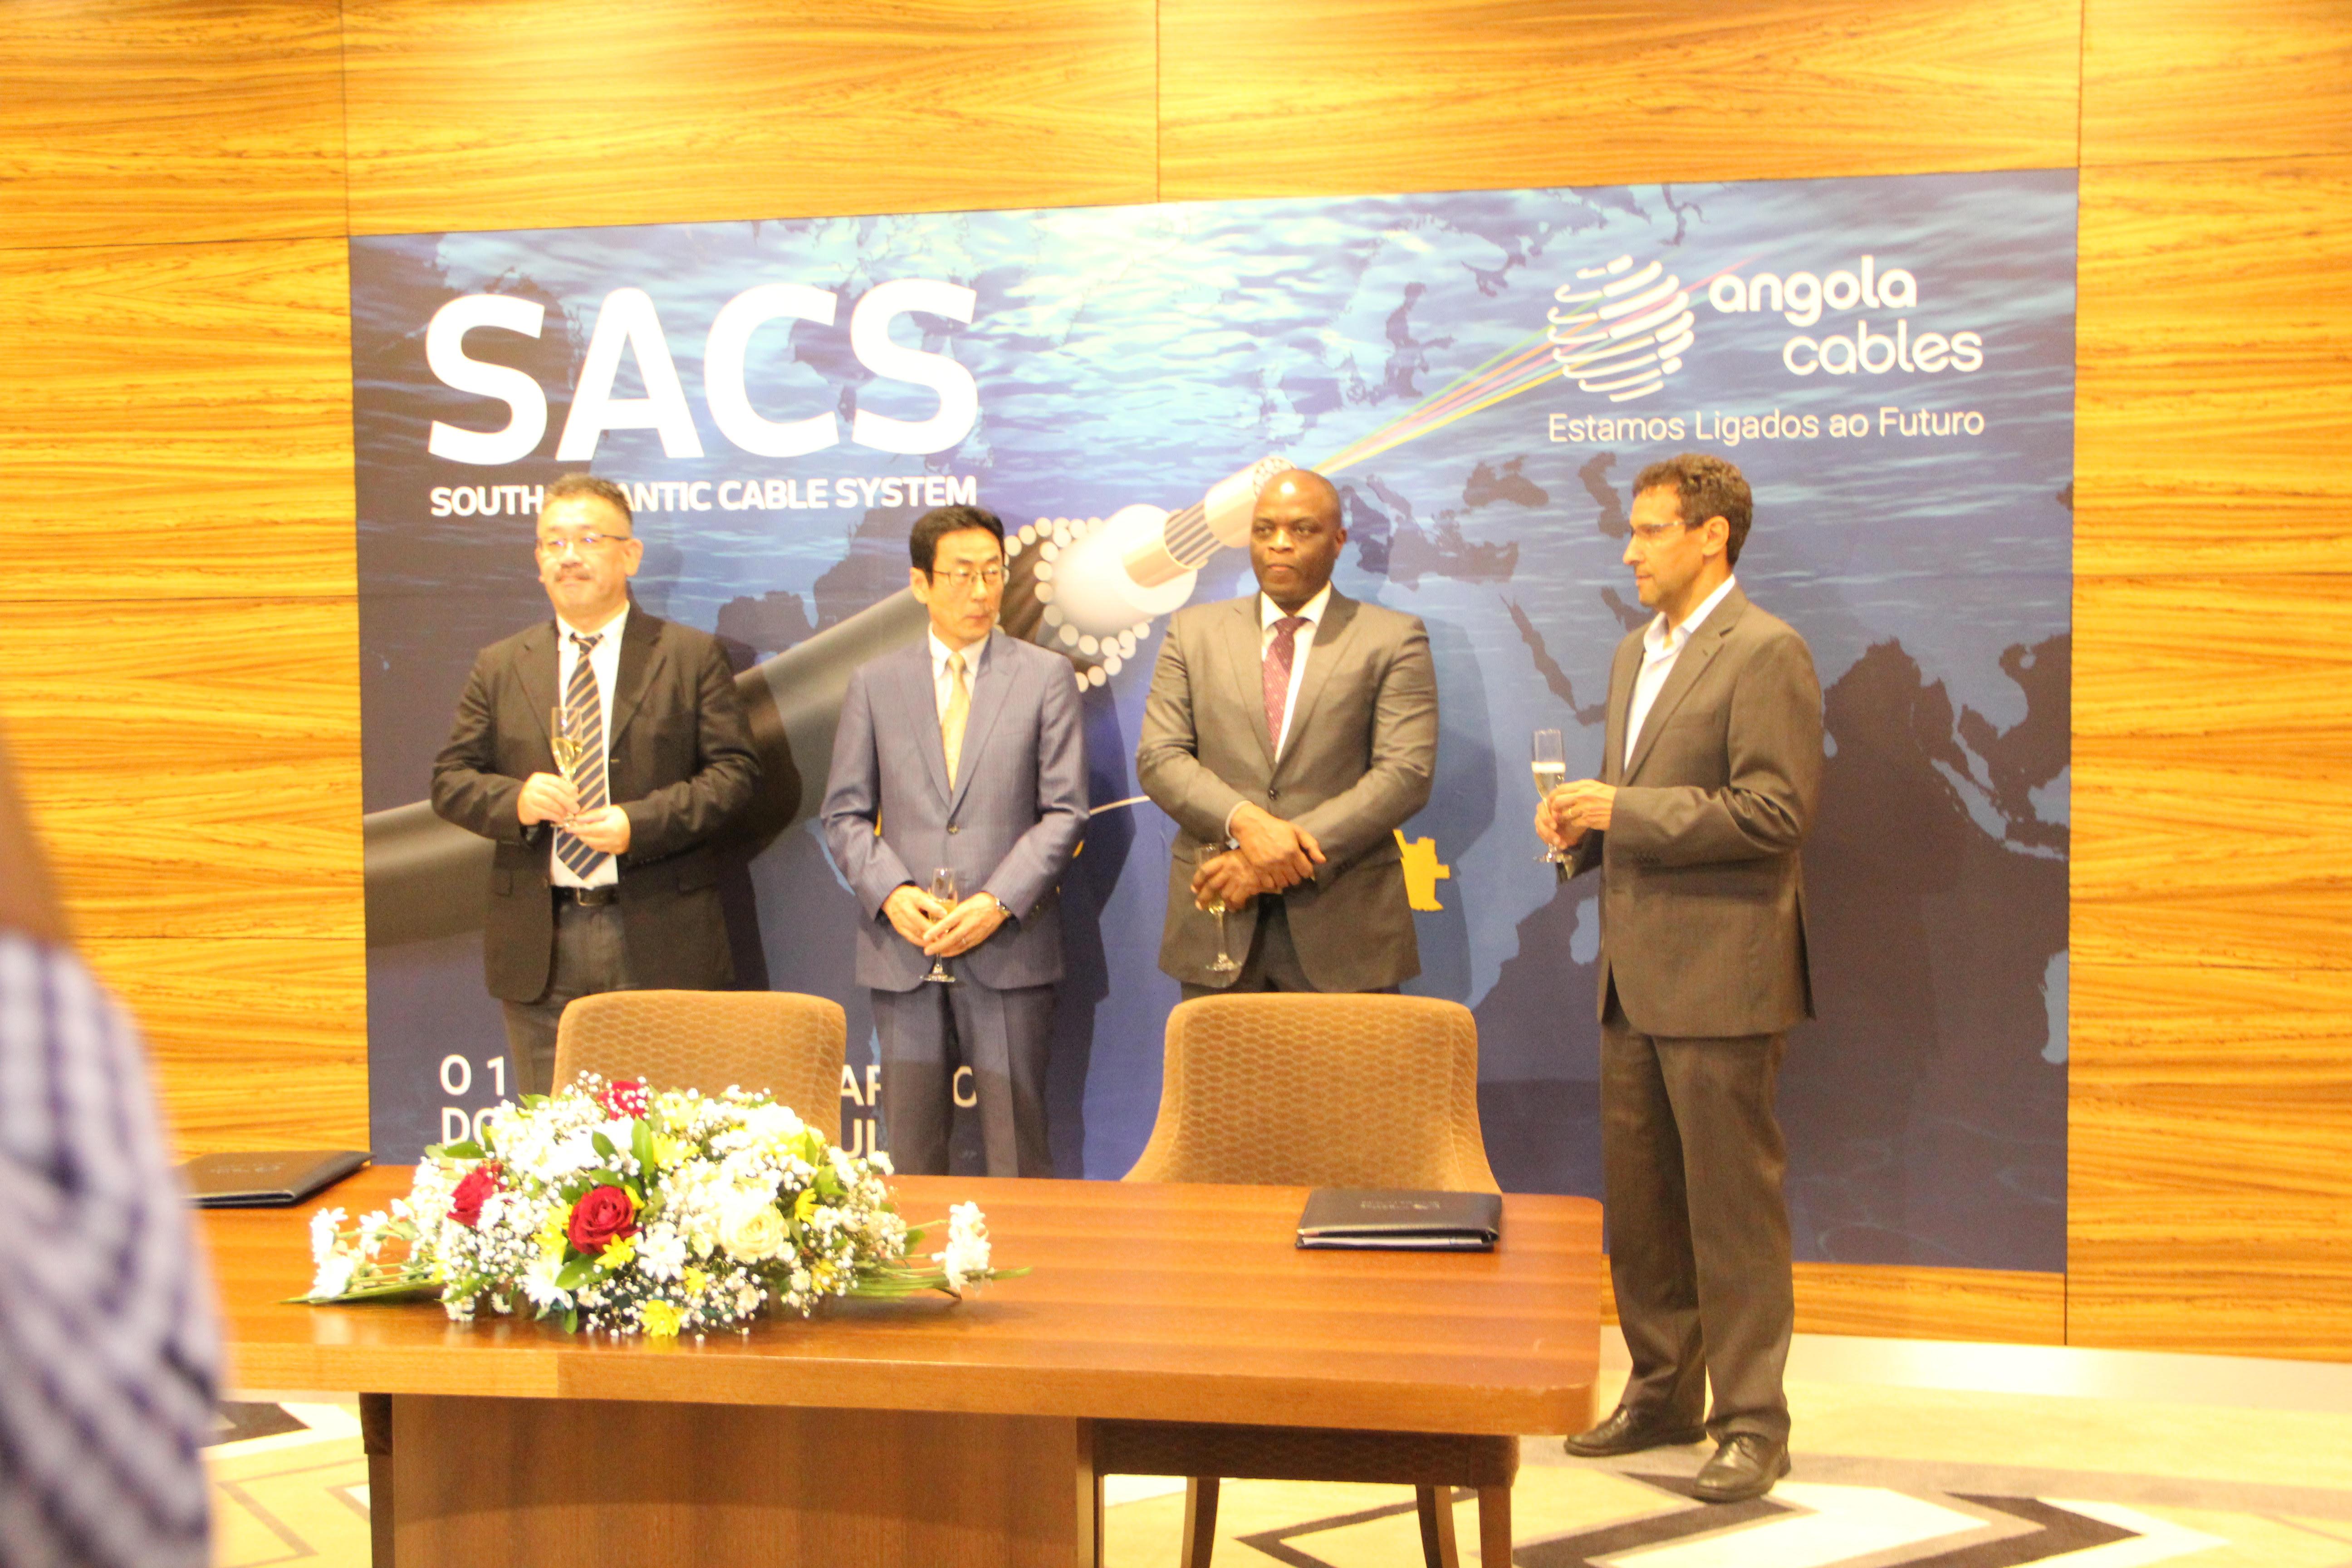 ... a data oficial do funcionamento do cabo submarino SACS, a Angola Cables  comemorou ontem 27 de Setembro de 2018, no Hotel Palmeiras, este grande  feito. 3d360ff55c